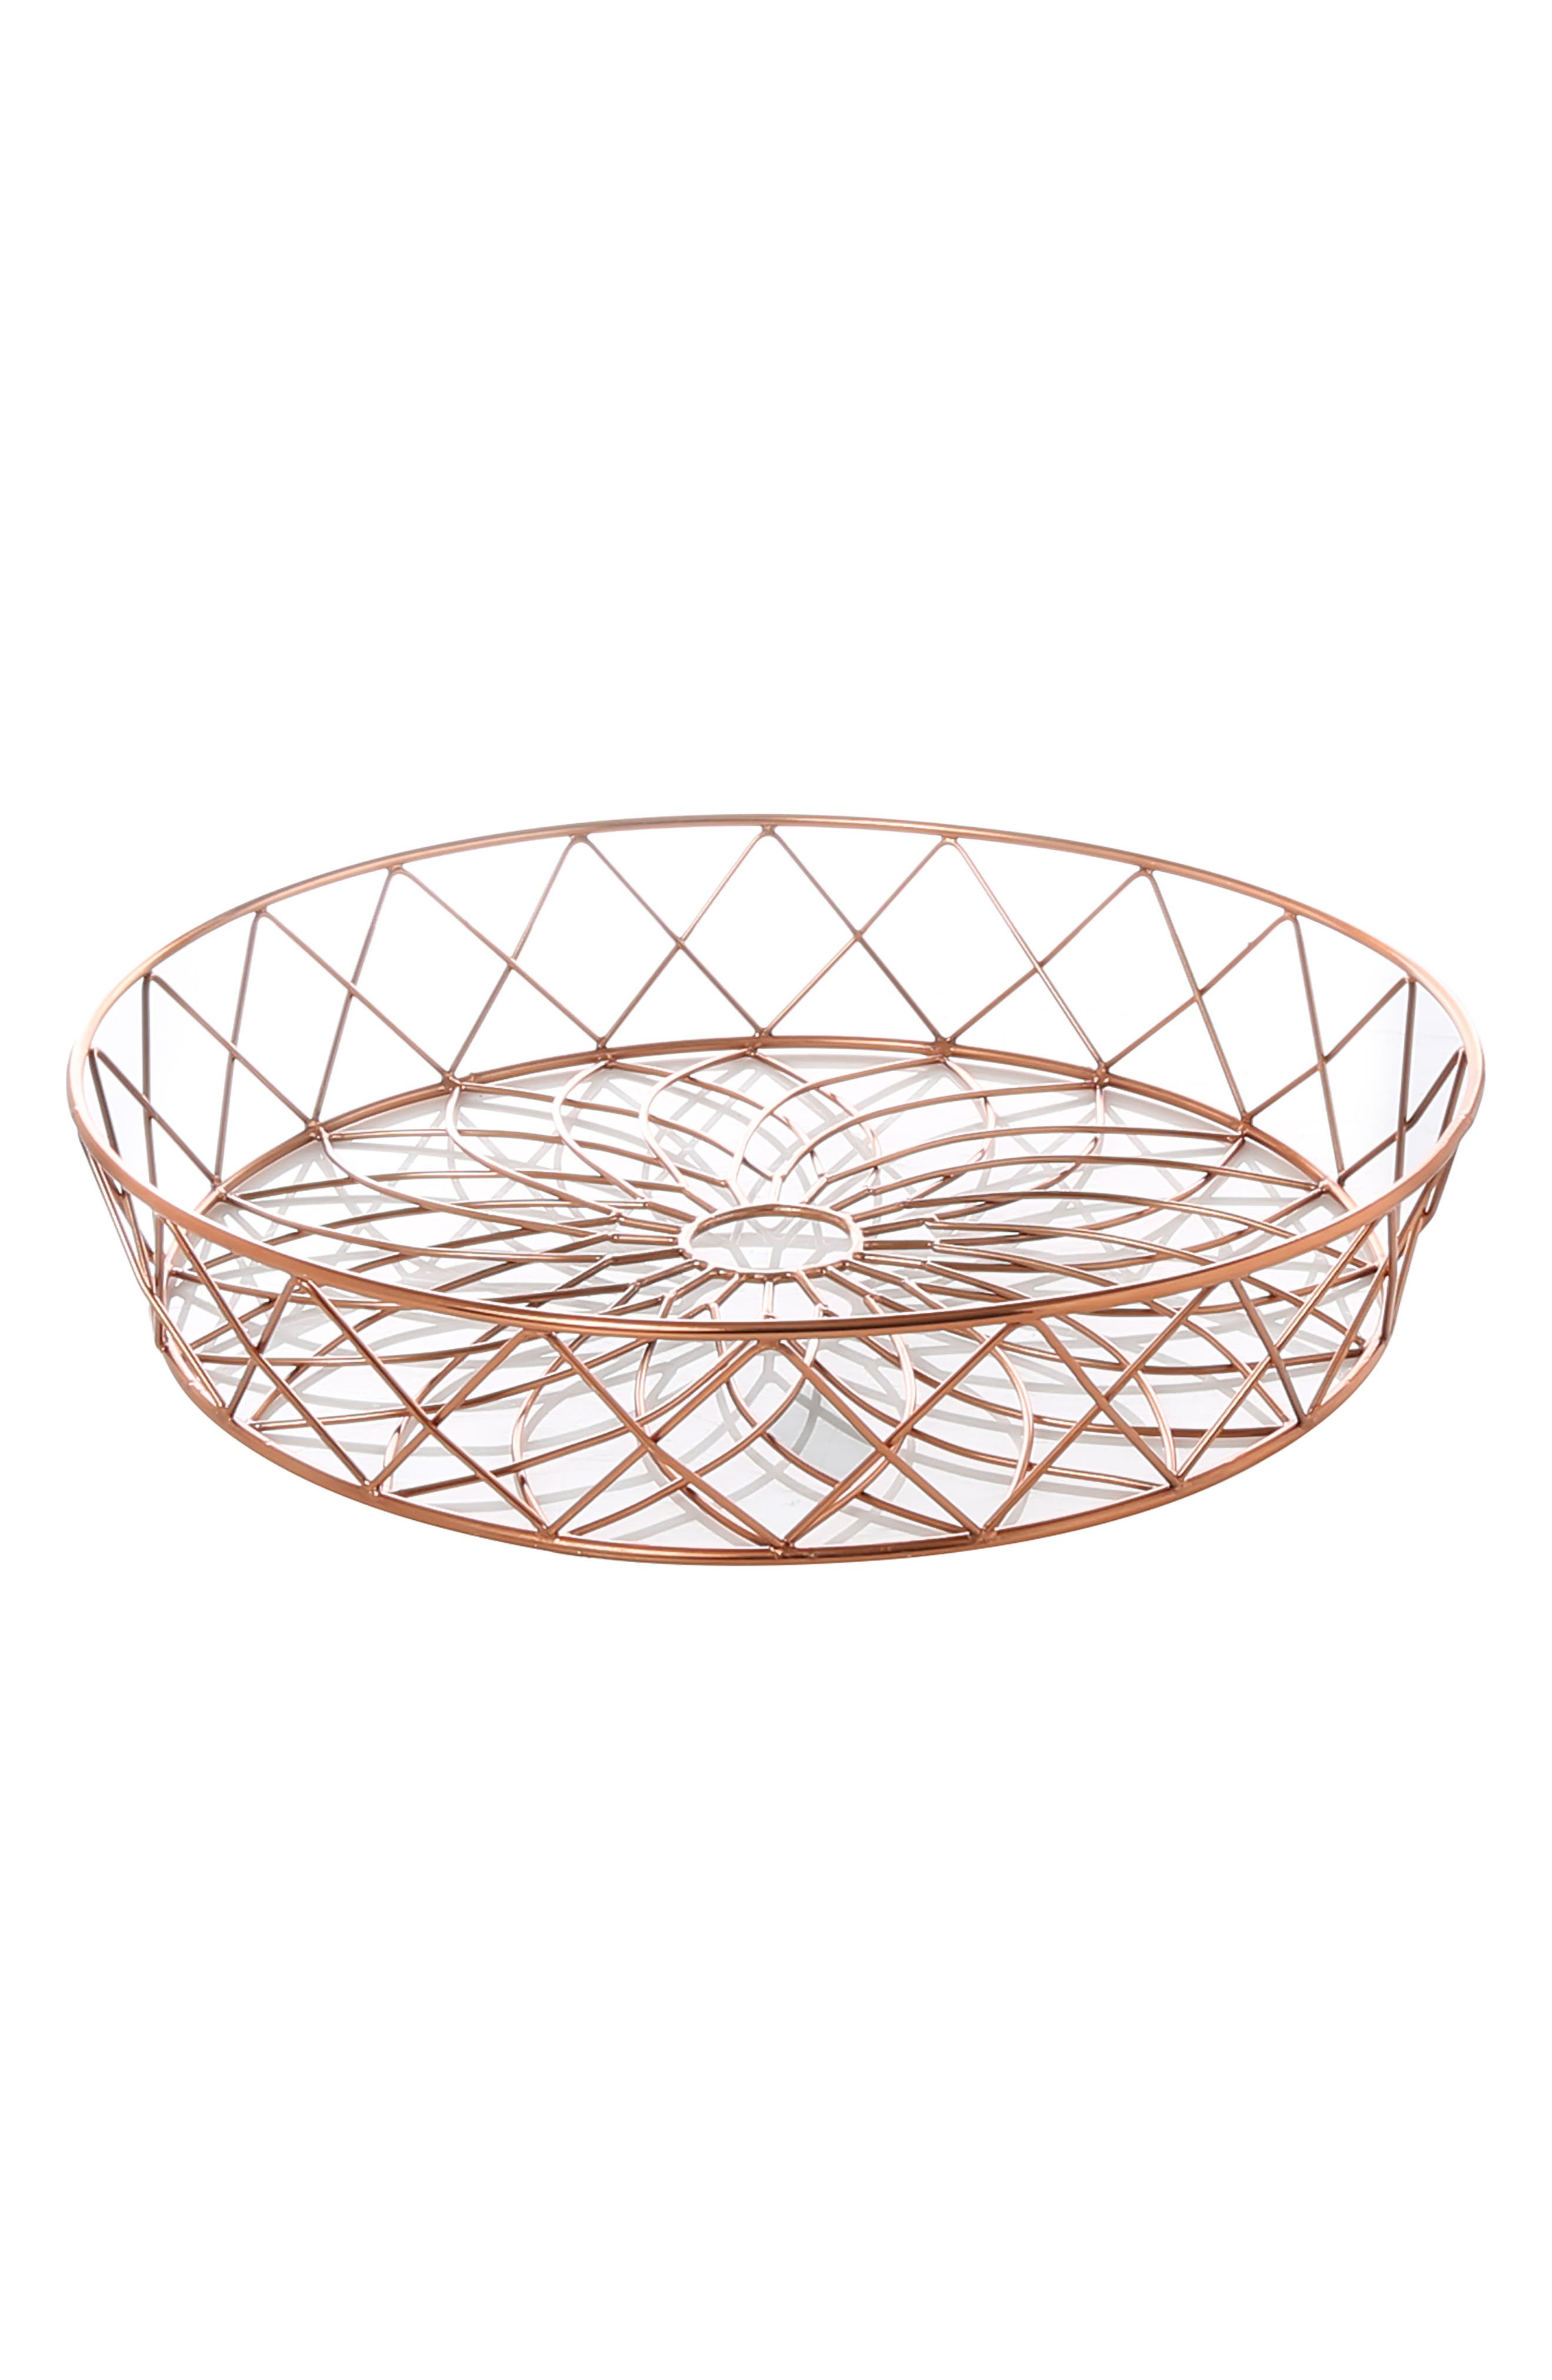 Copper Finish Wire Basket,                             Main thumbnail 1, color,                             220